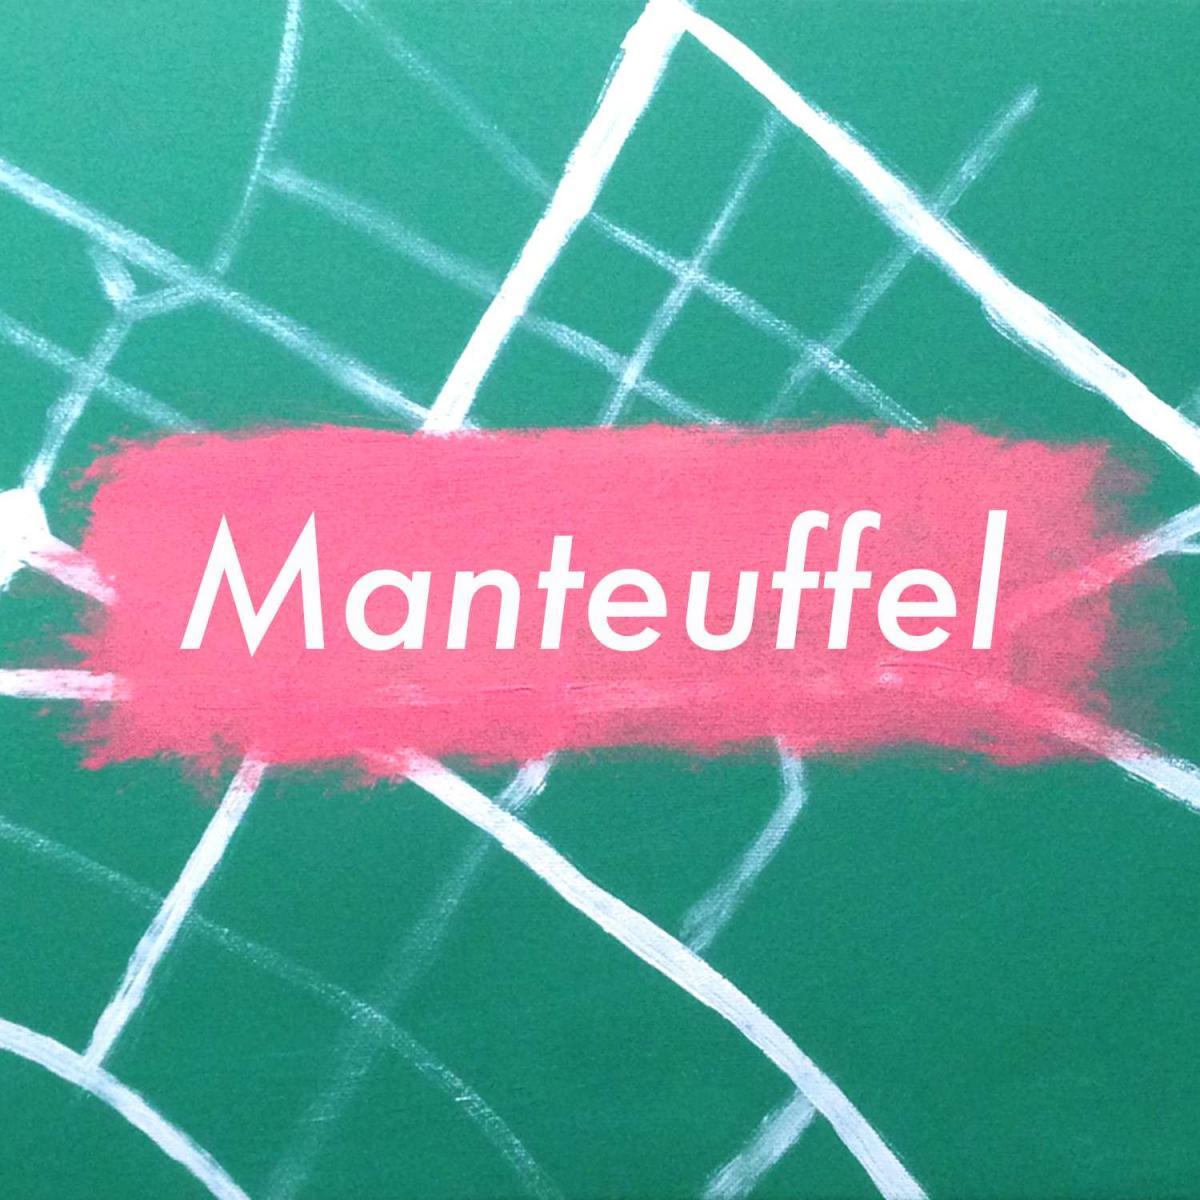 Upcoming: Senor, The Dude - Manteuffel - EP